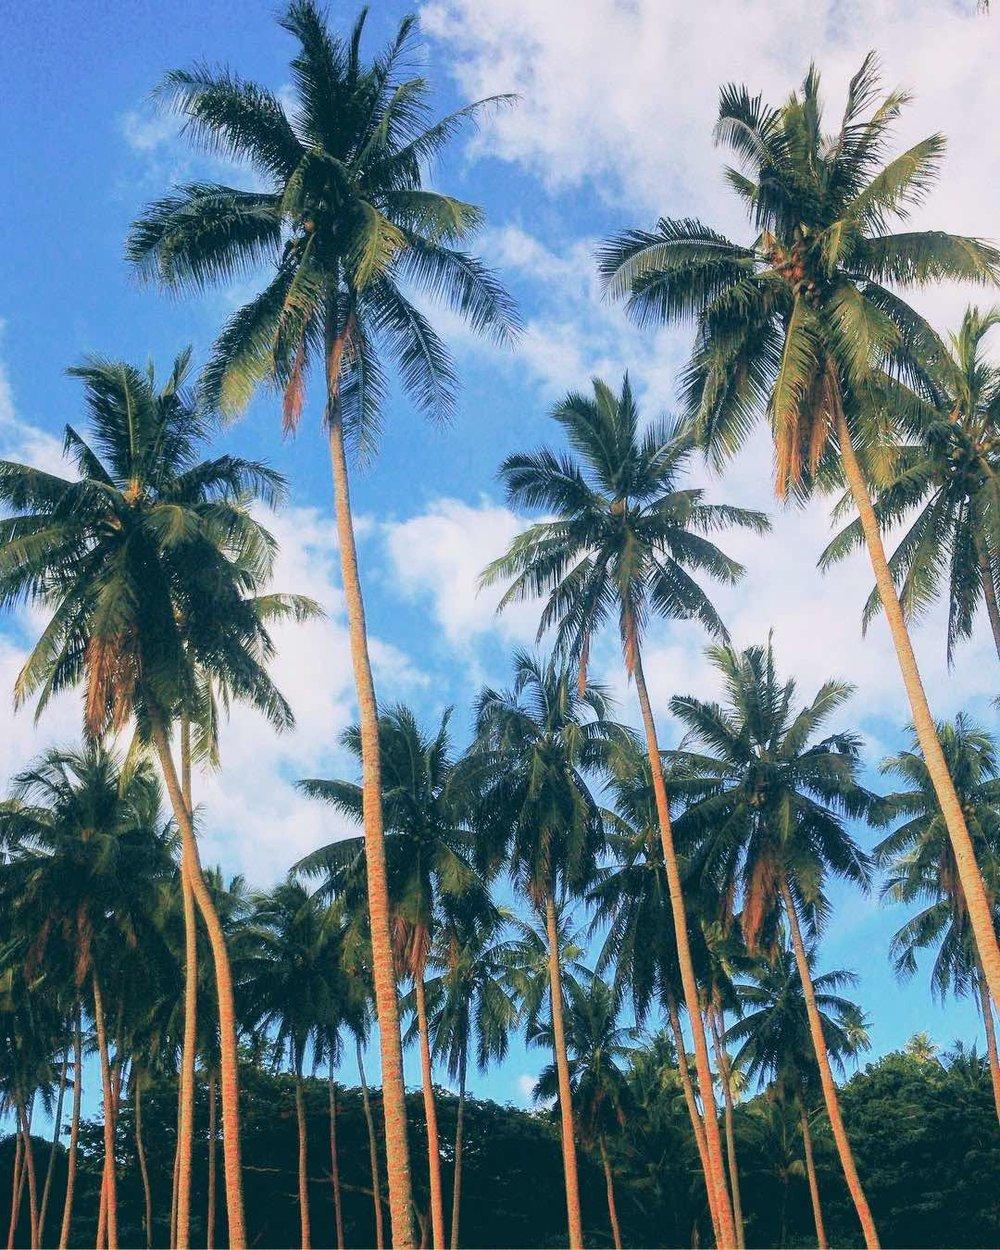 Palm trees at Taveuni Island, Fiji